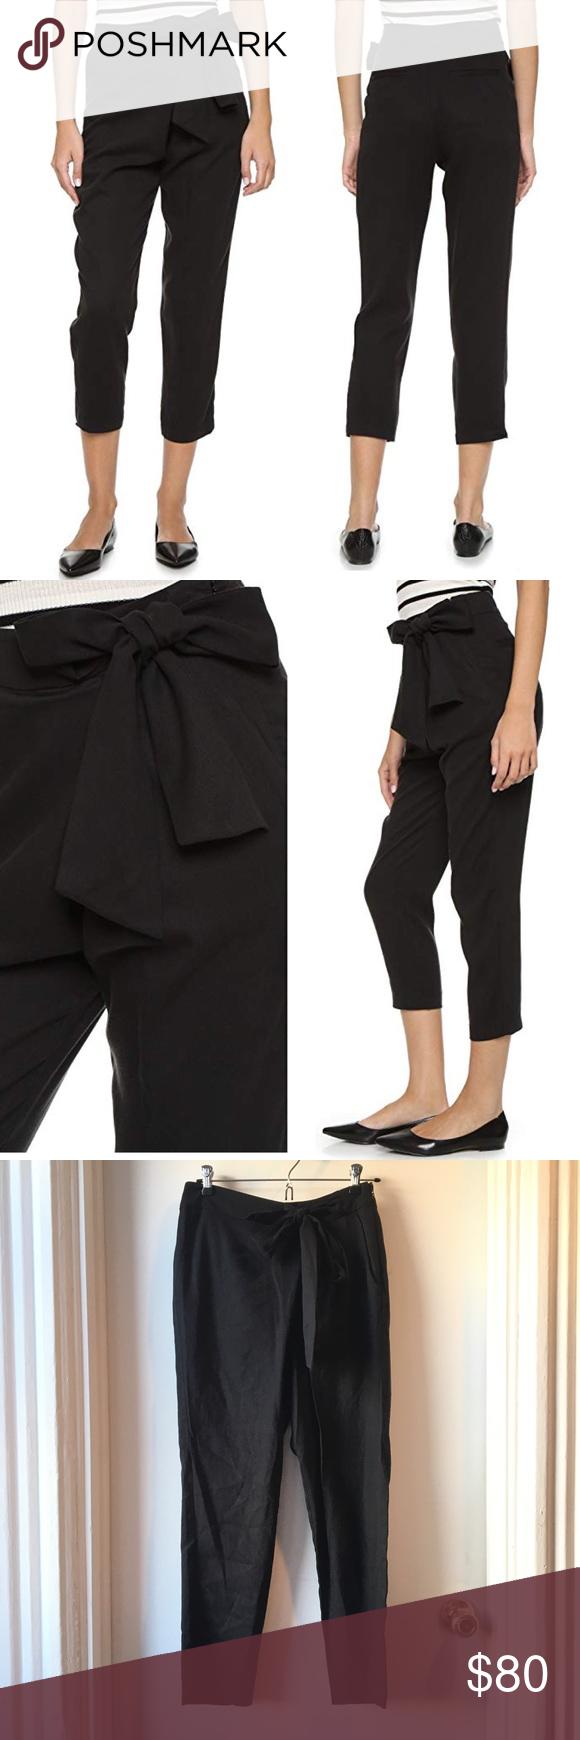 Ella Moss Black Elastic Waist Tie Sash Detail Casual Shorts Size Medium Women's Clothing